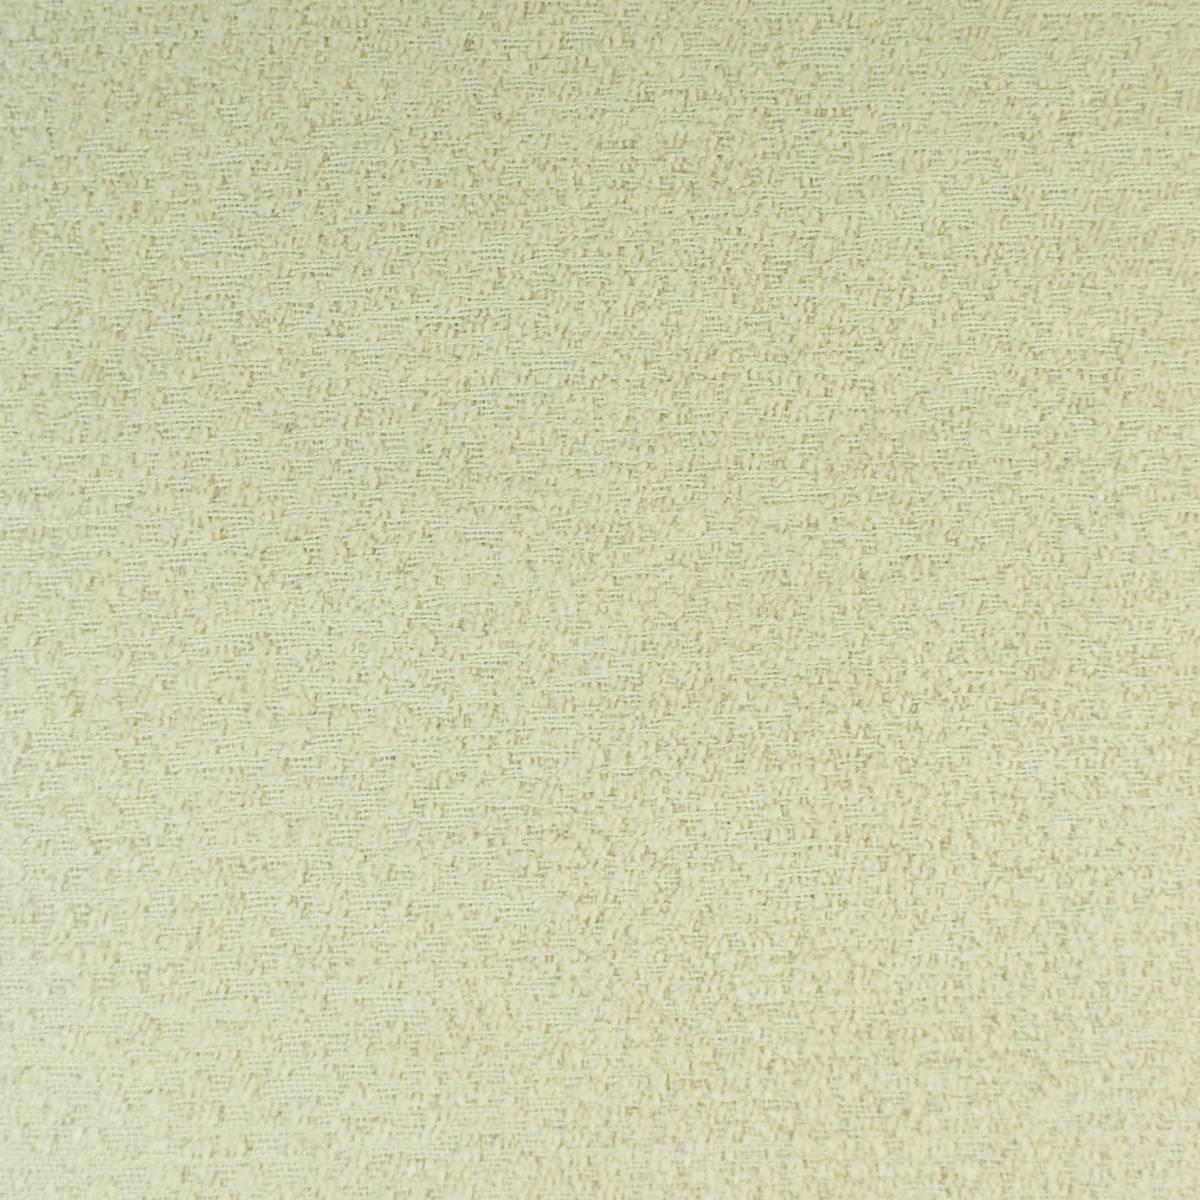 Pippa Fabric 002 Pippa002 Blendworth Fabrics Pippa Fabrics Collection